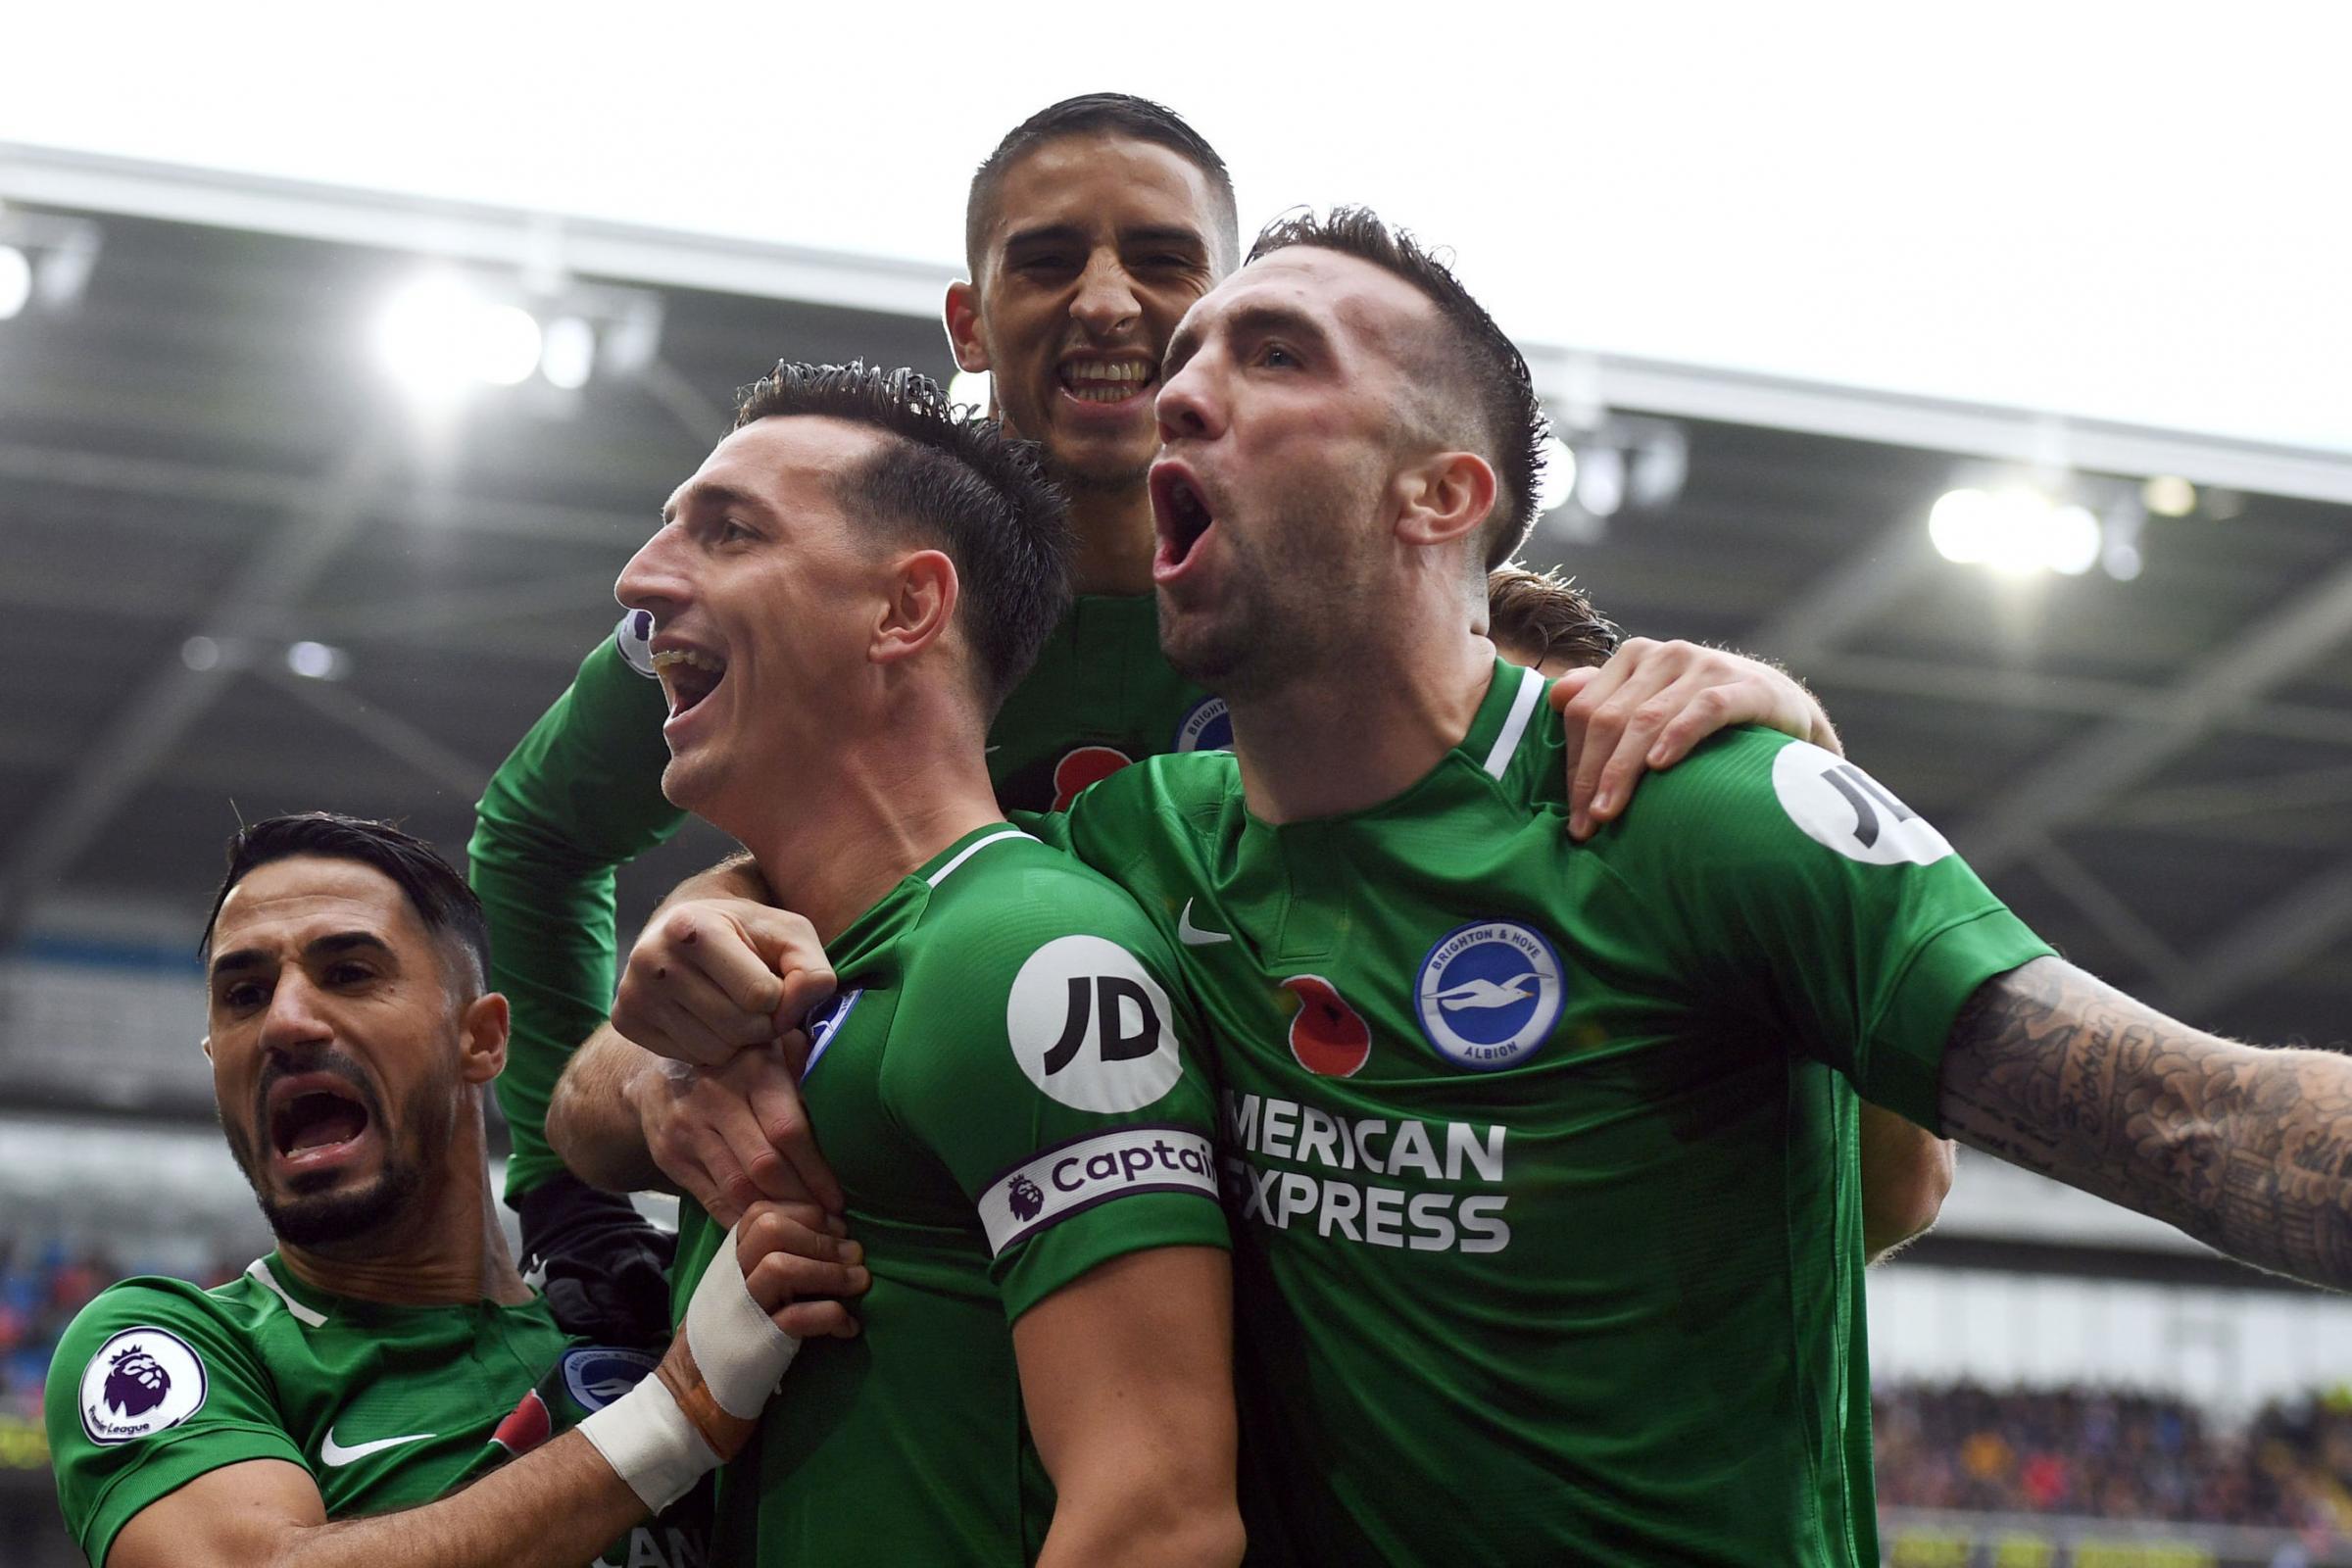 Albion's Duffy says team-mate Dunk deserves an England cap